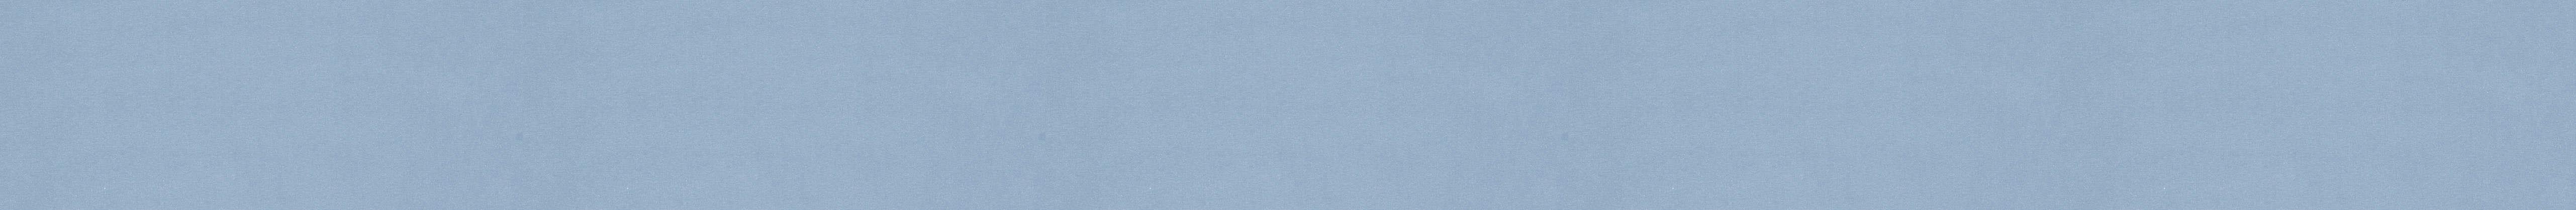 banner-microfibra